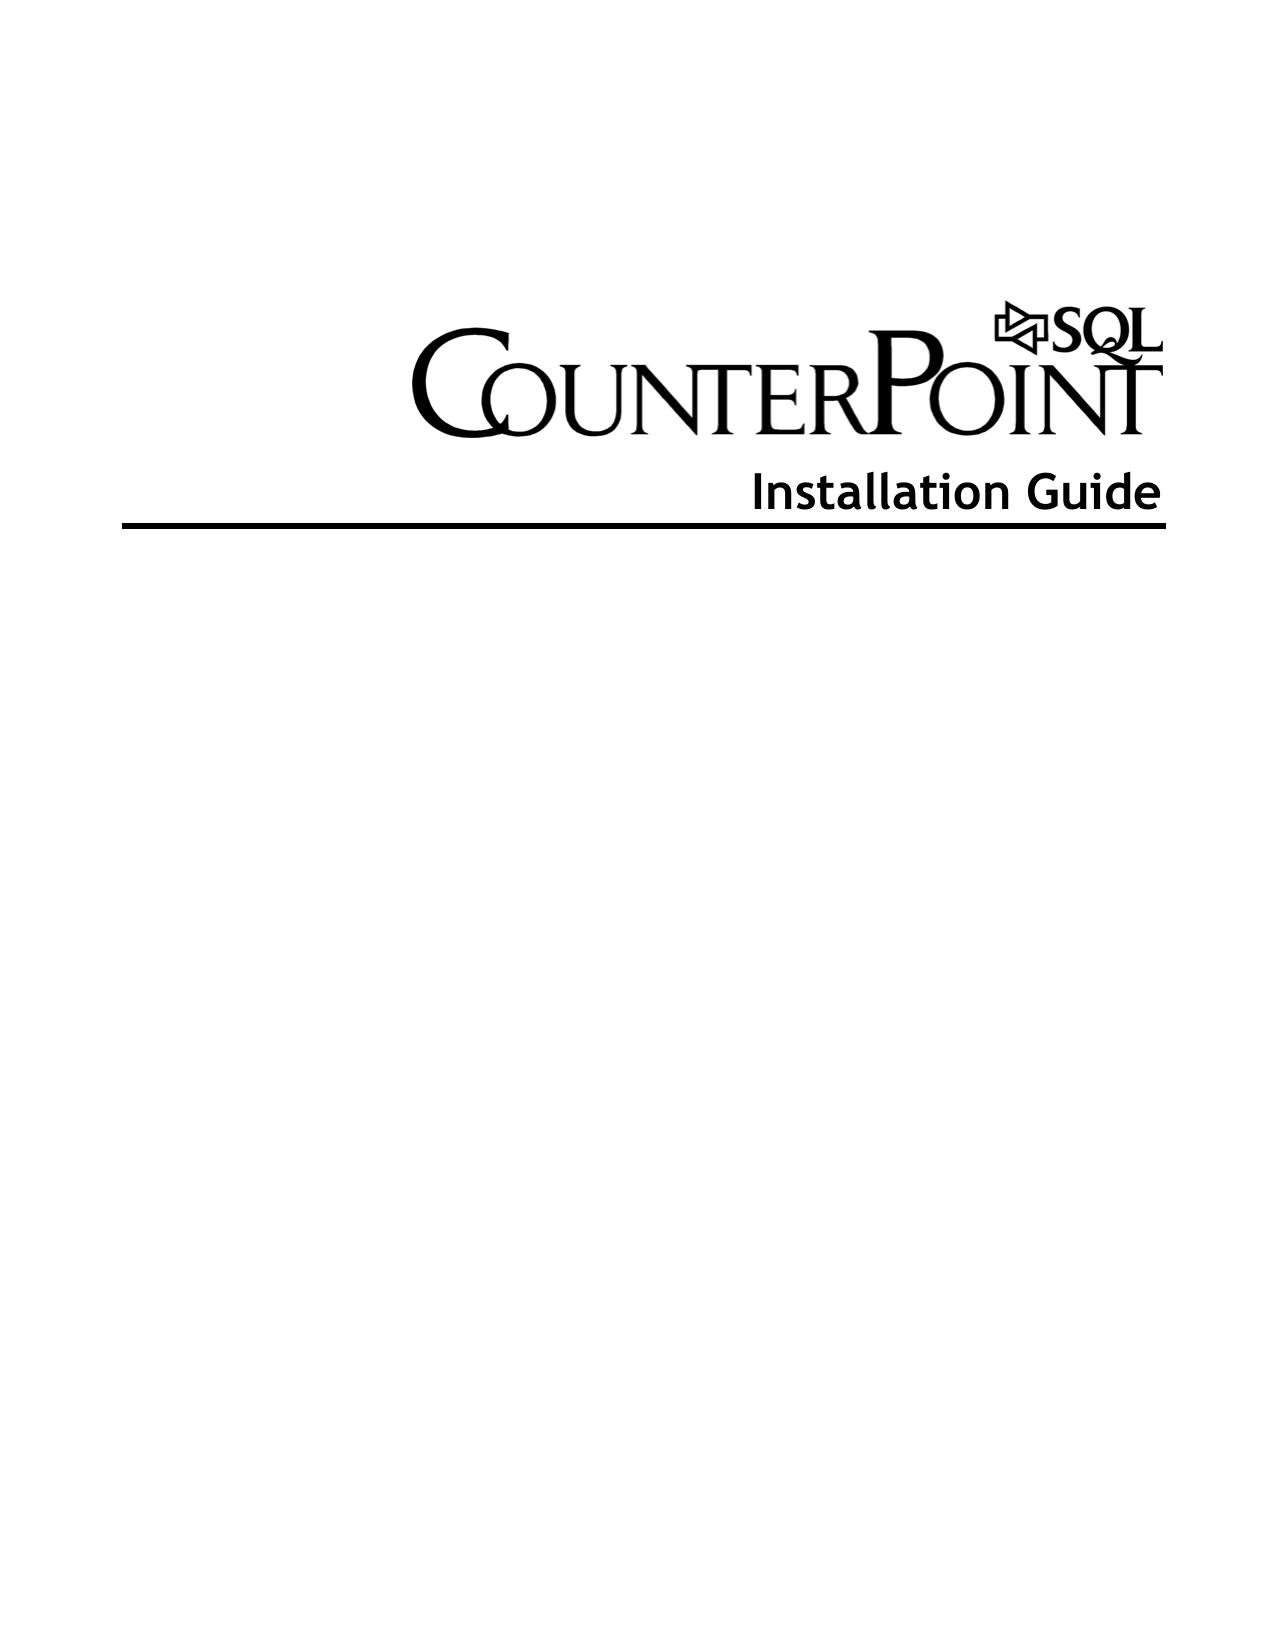 CounterPoint SQL Installation Guide | manualzz com